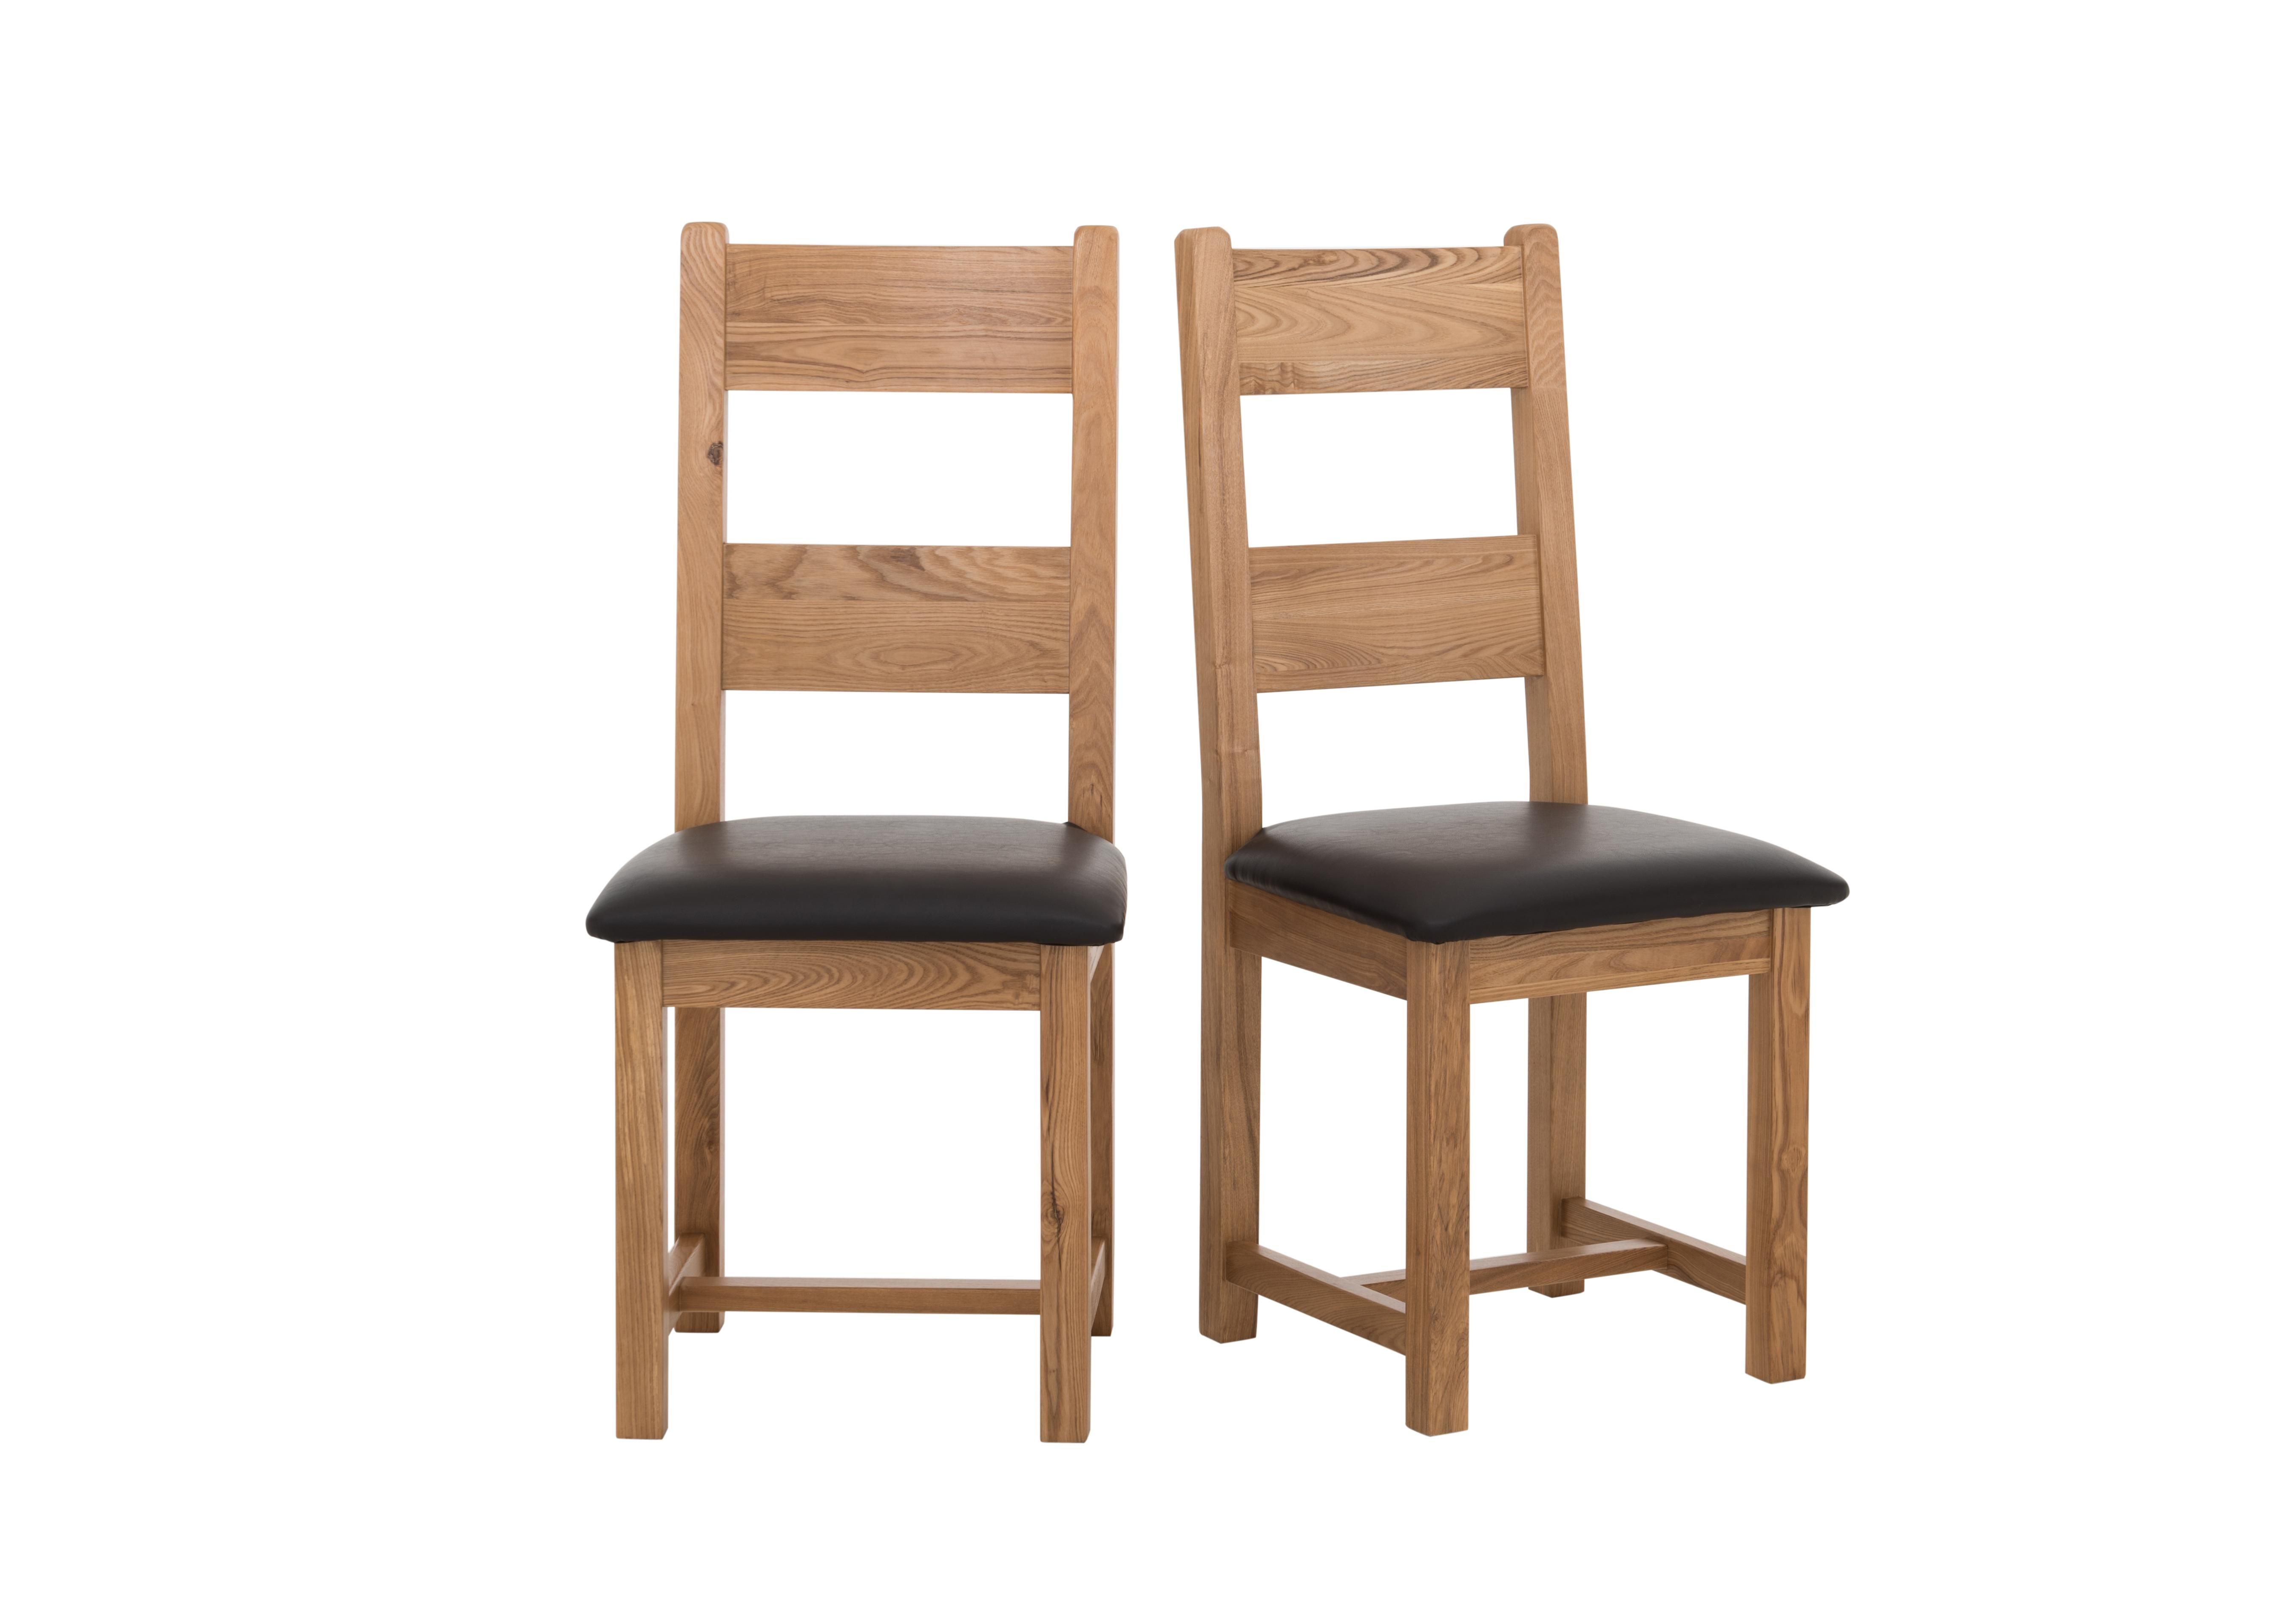 Furnitureland California Pair Of Wood Ladderback Chairs